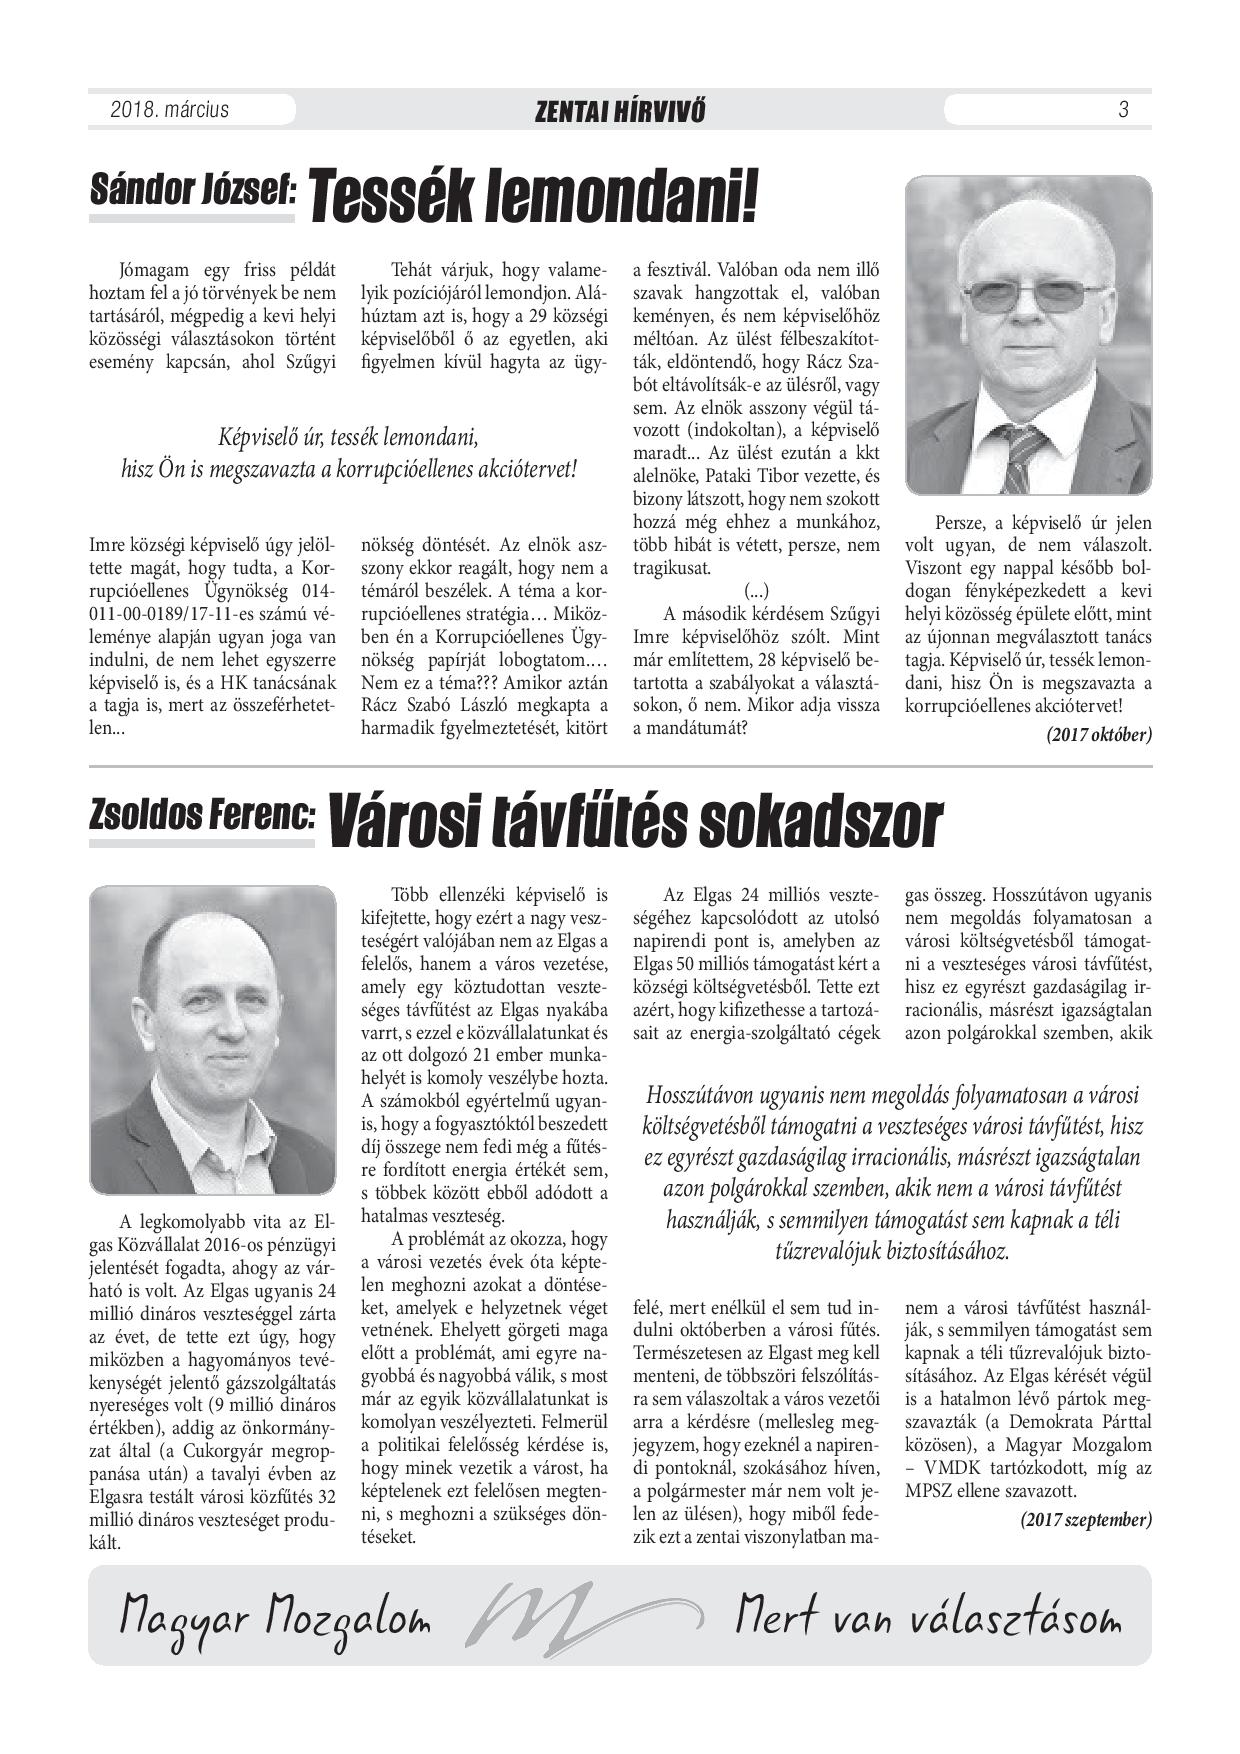 zentai_hirvivo_2018_03_-page-003.jpg